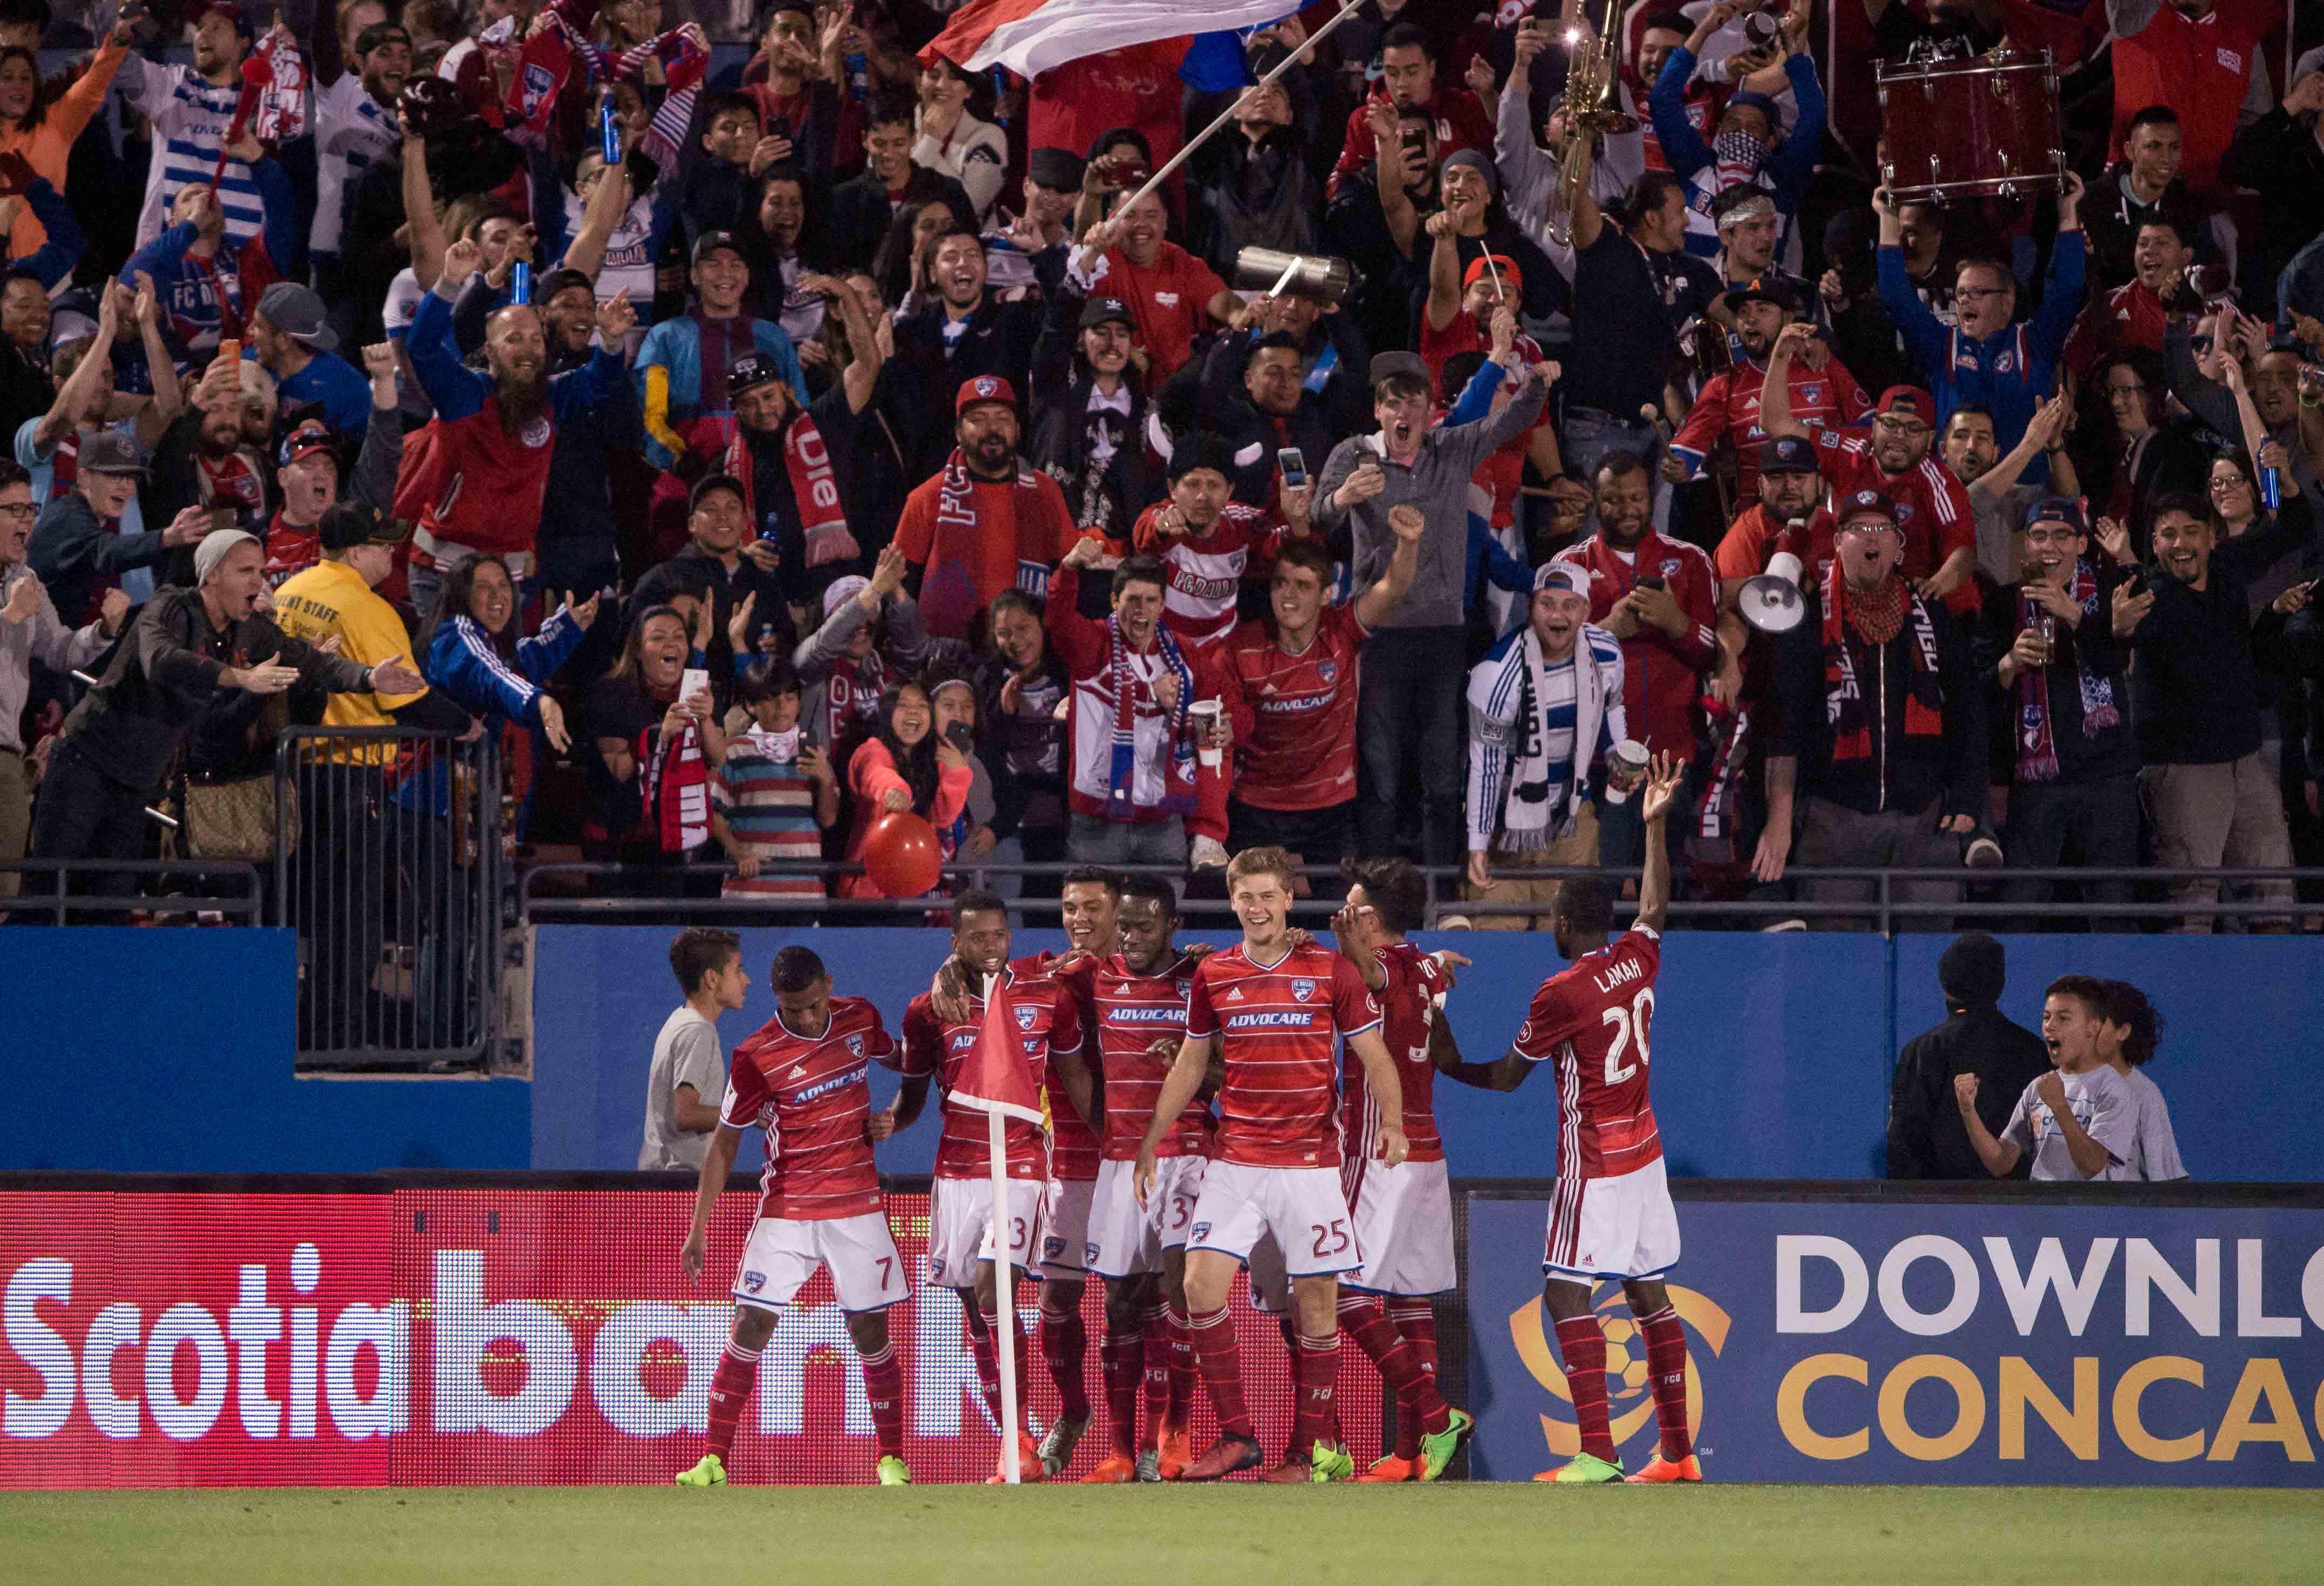 CONCACAF Champions League - Big D Soccer